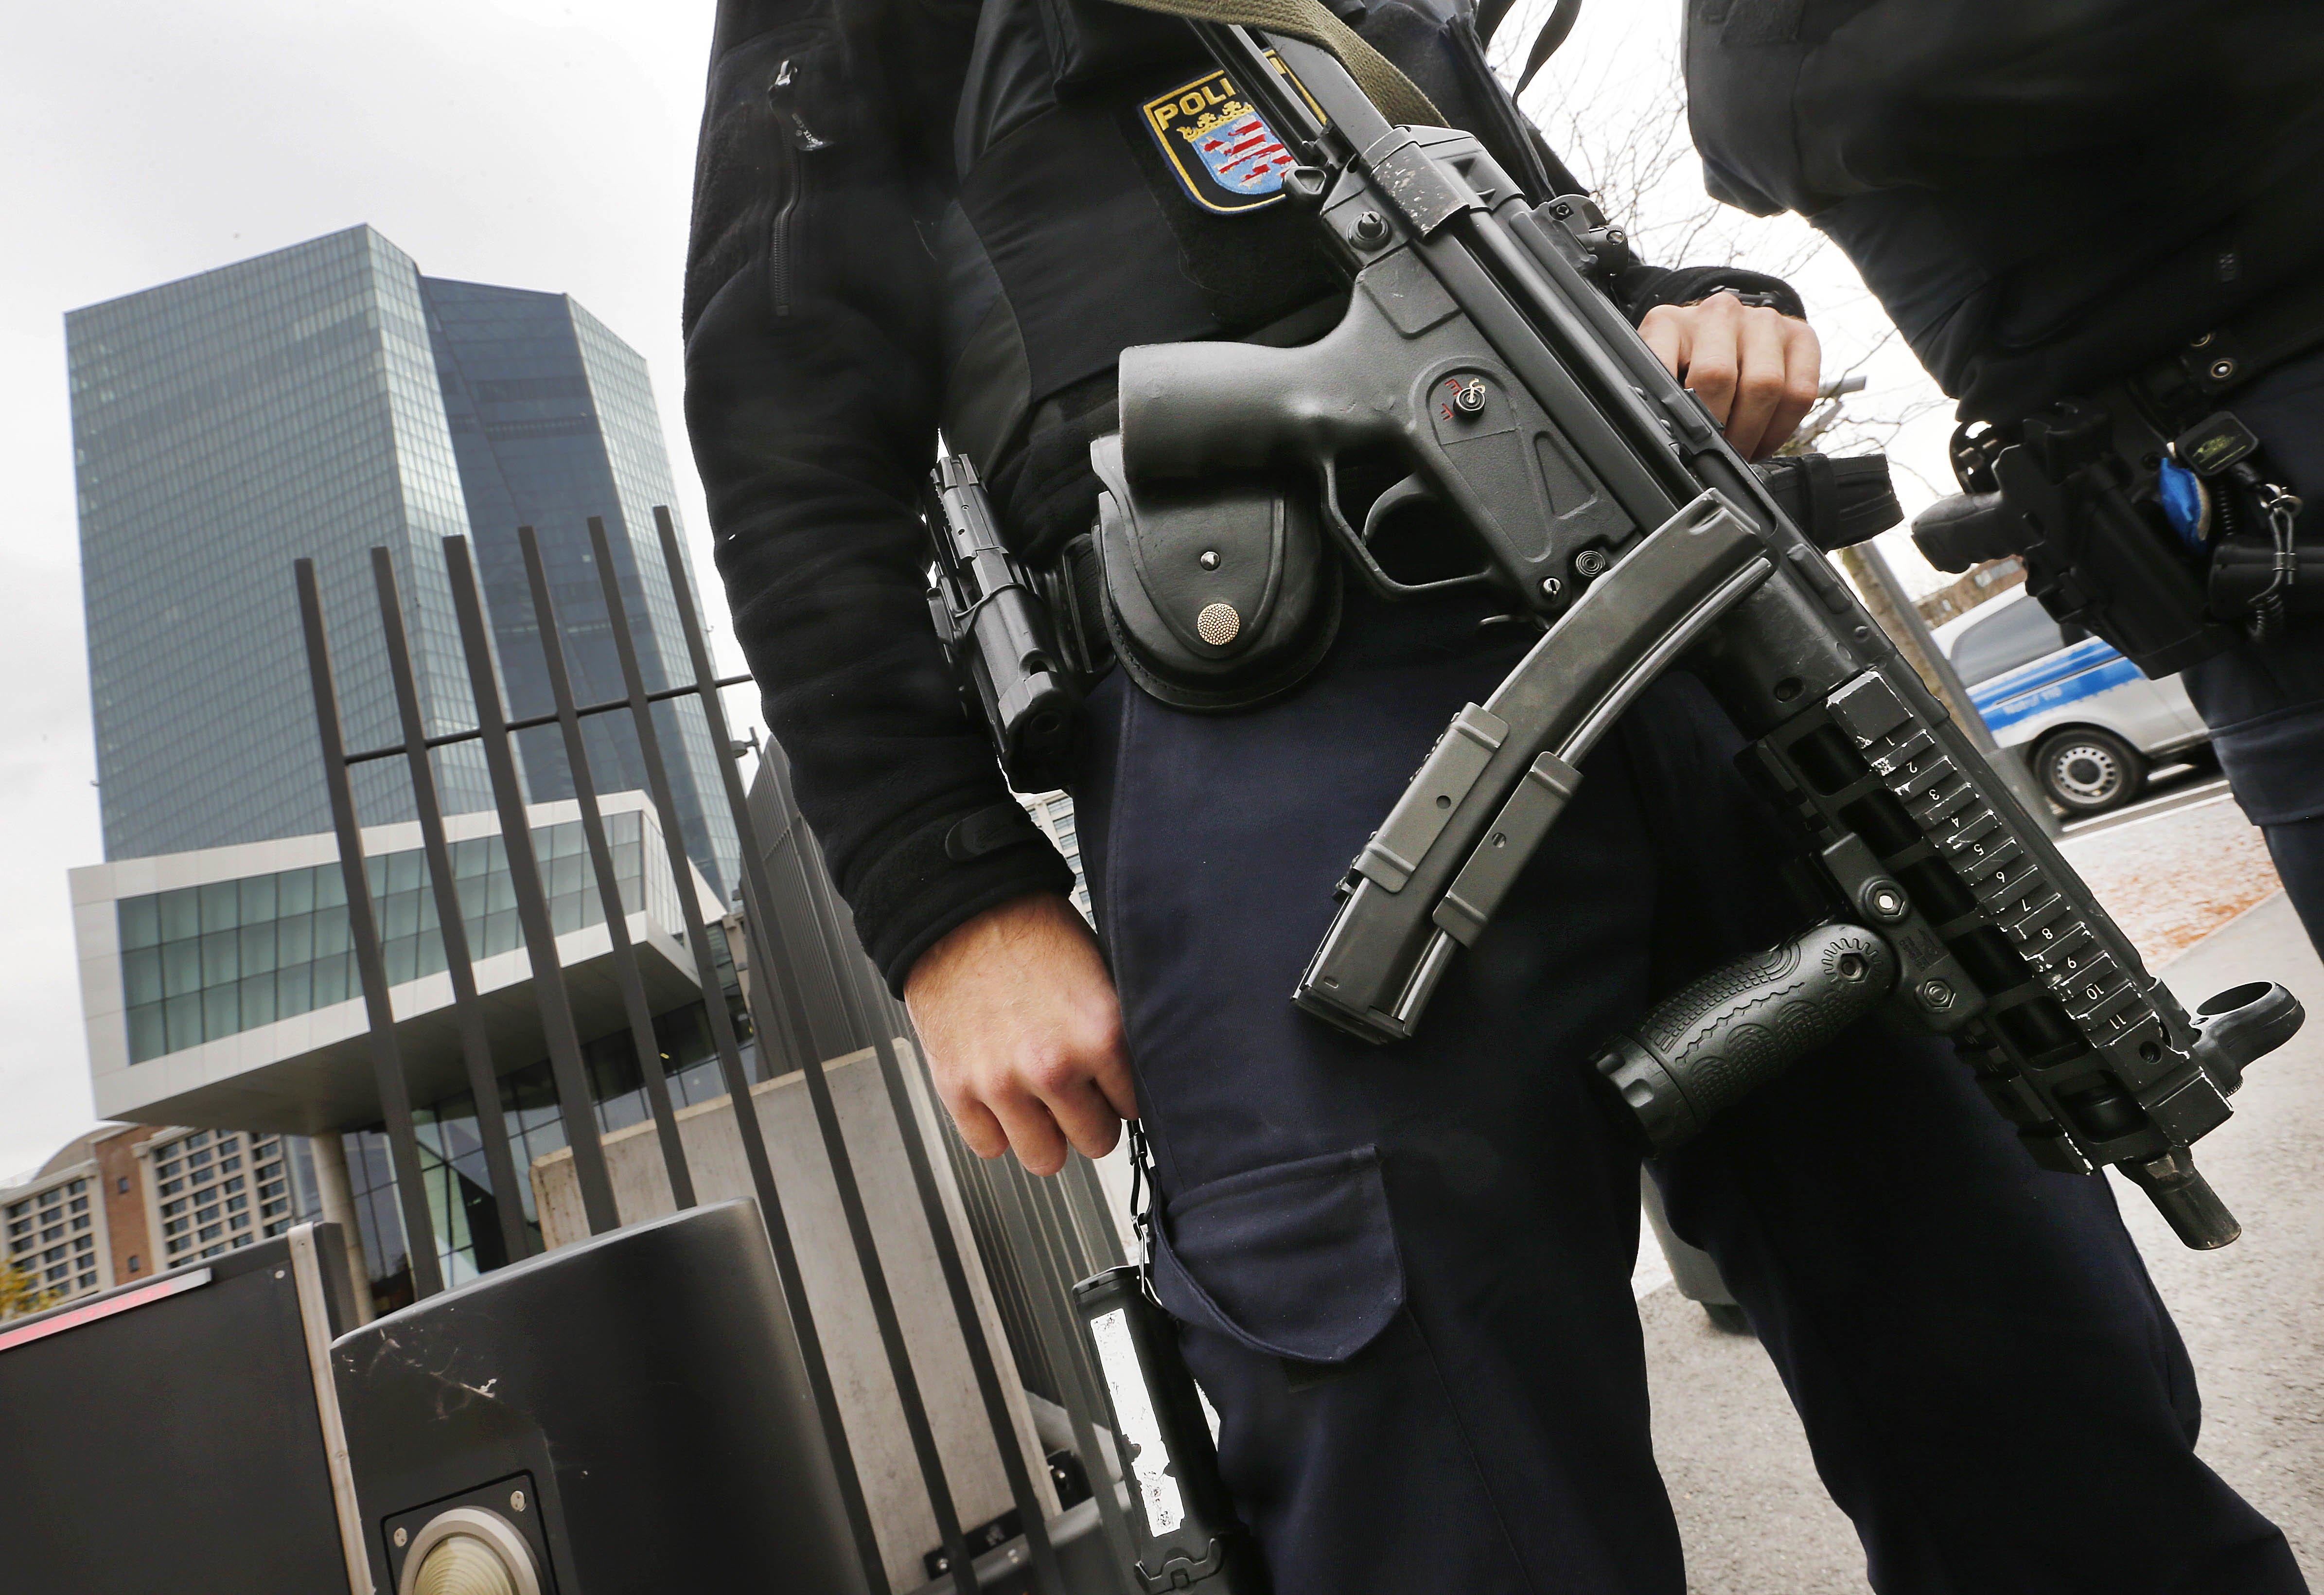 Polizei Prävention